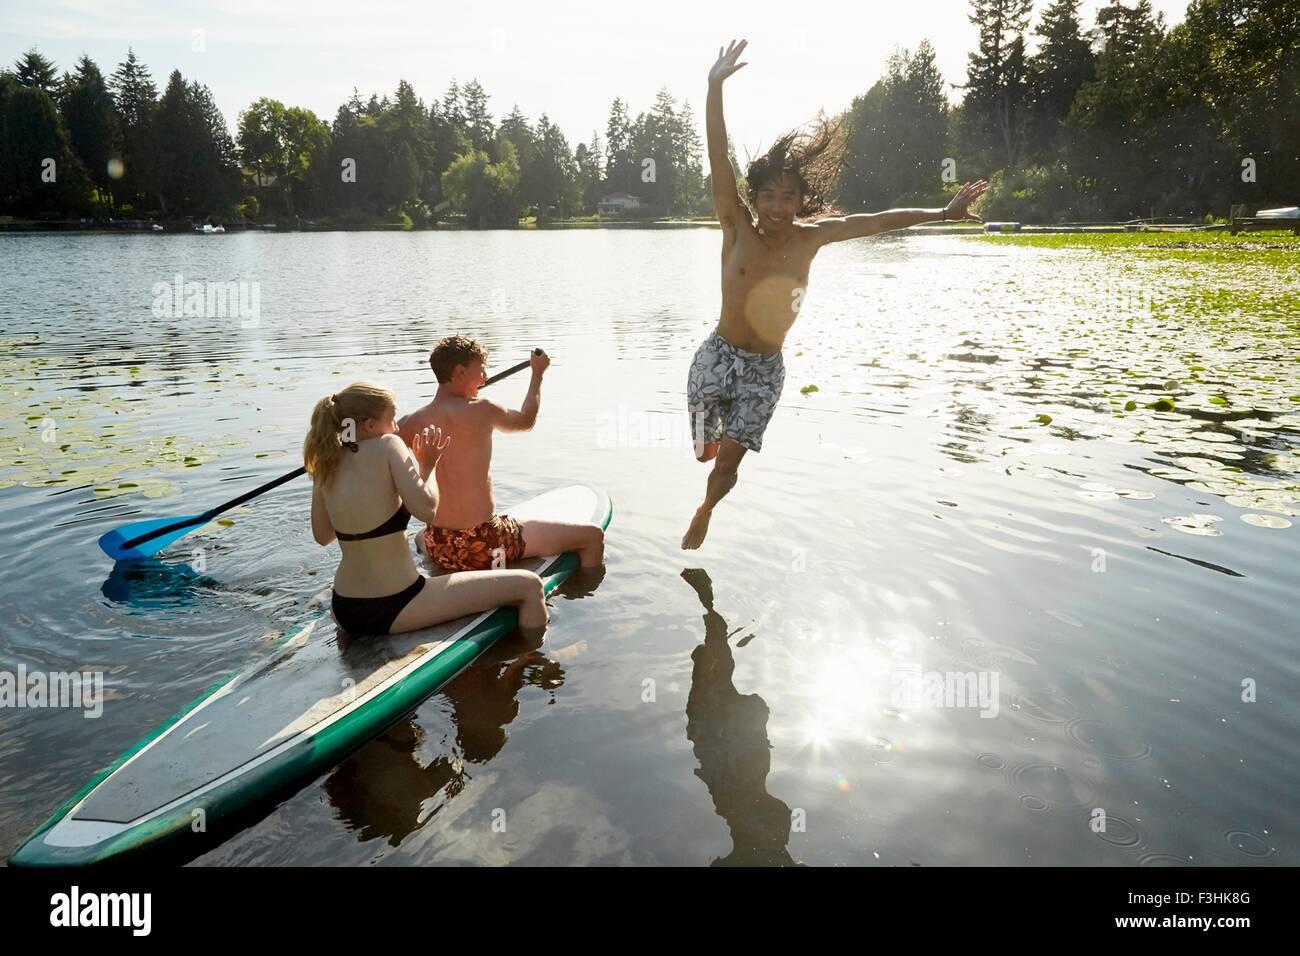 Giovane paddling barca, uomo saltando nel lago, Seattle, Washington, Stati Uniti d'America Foto Stock